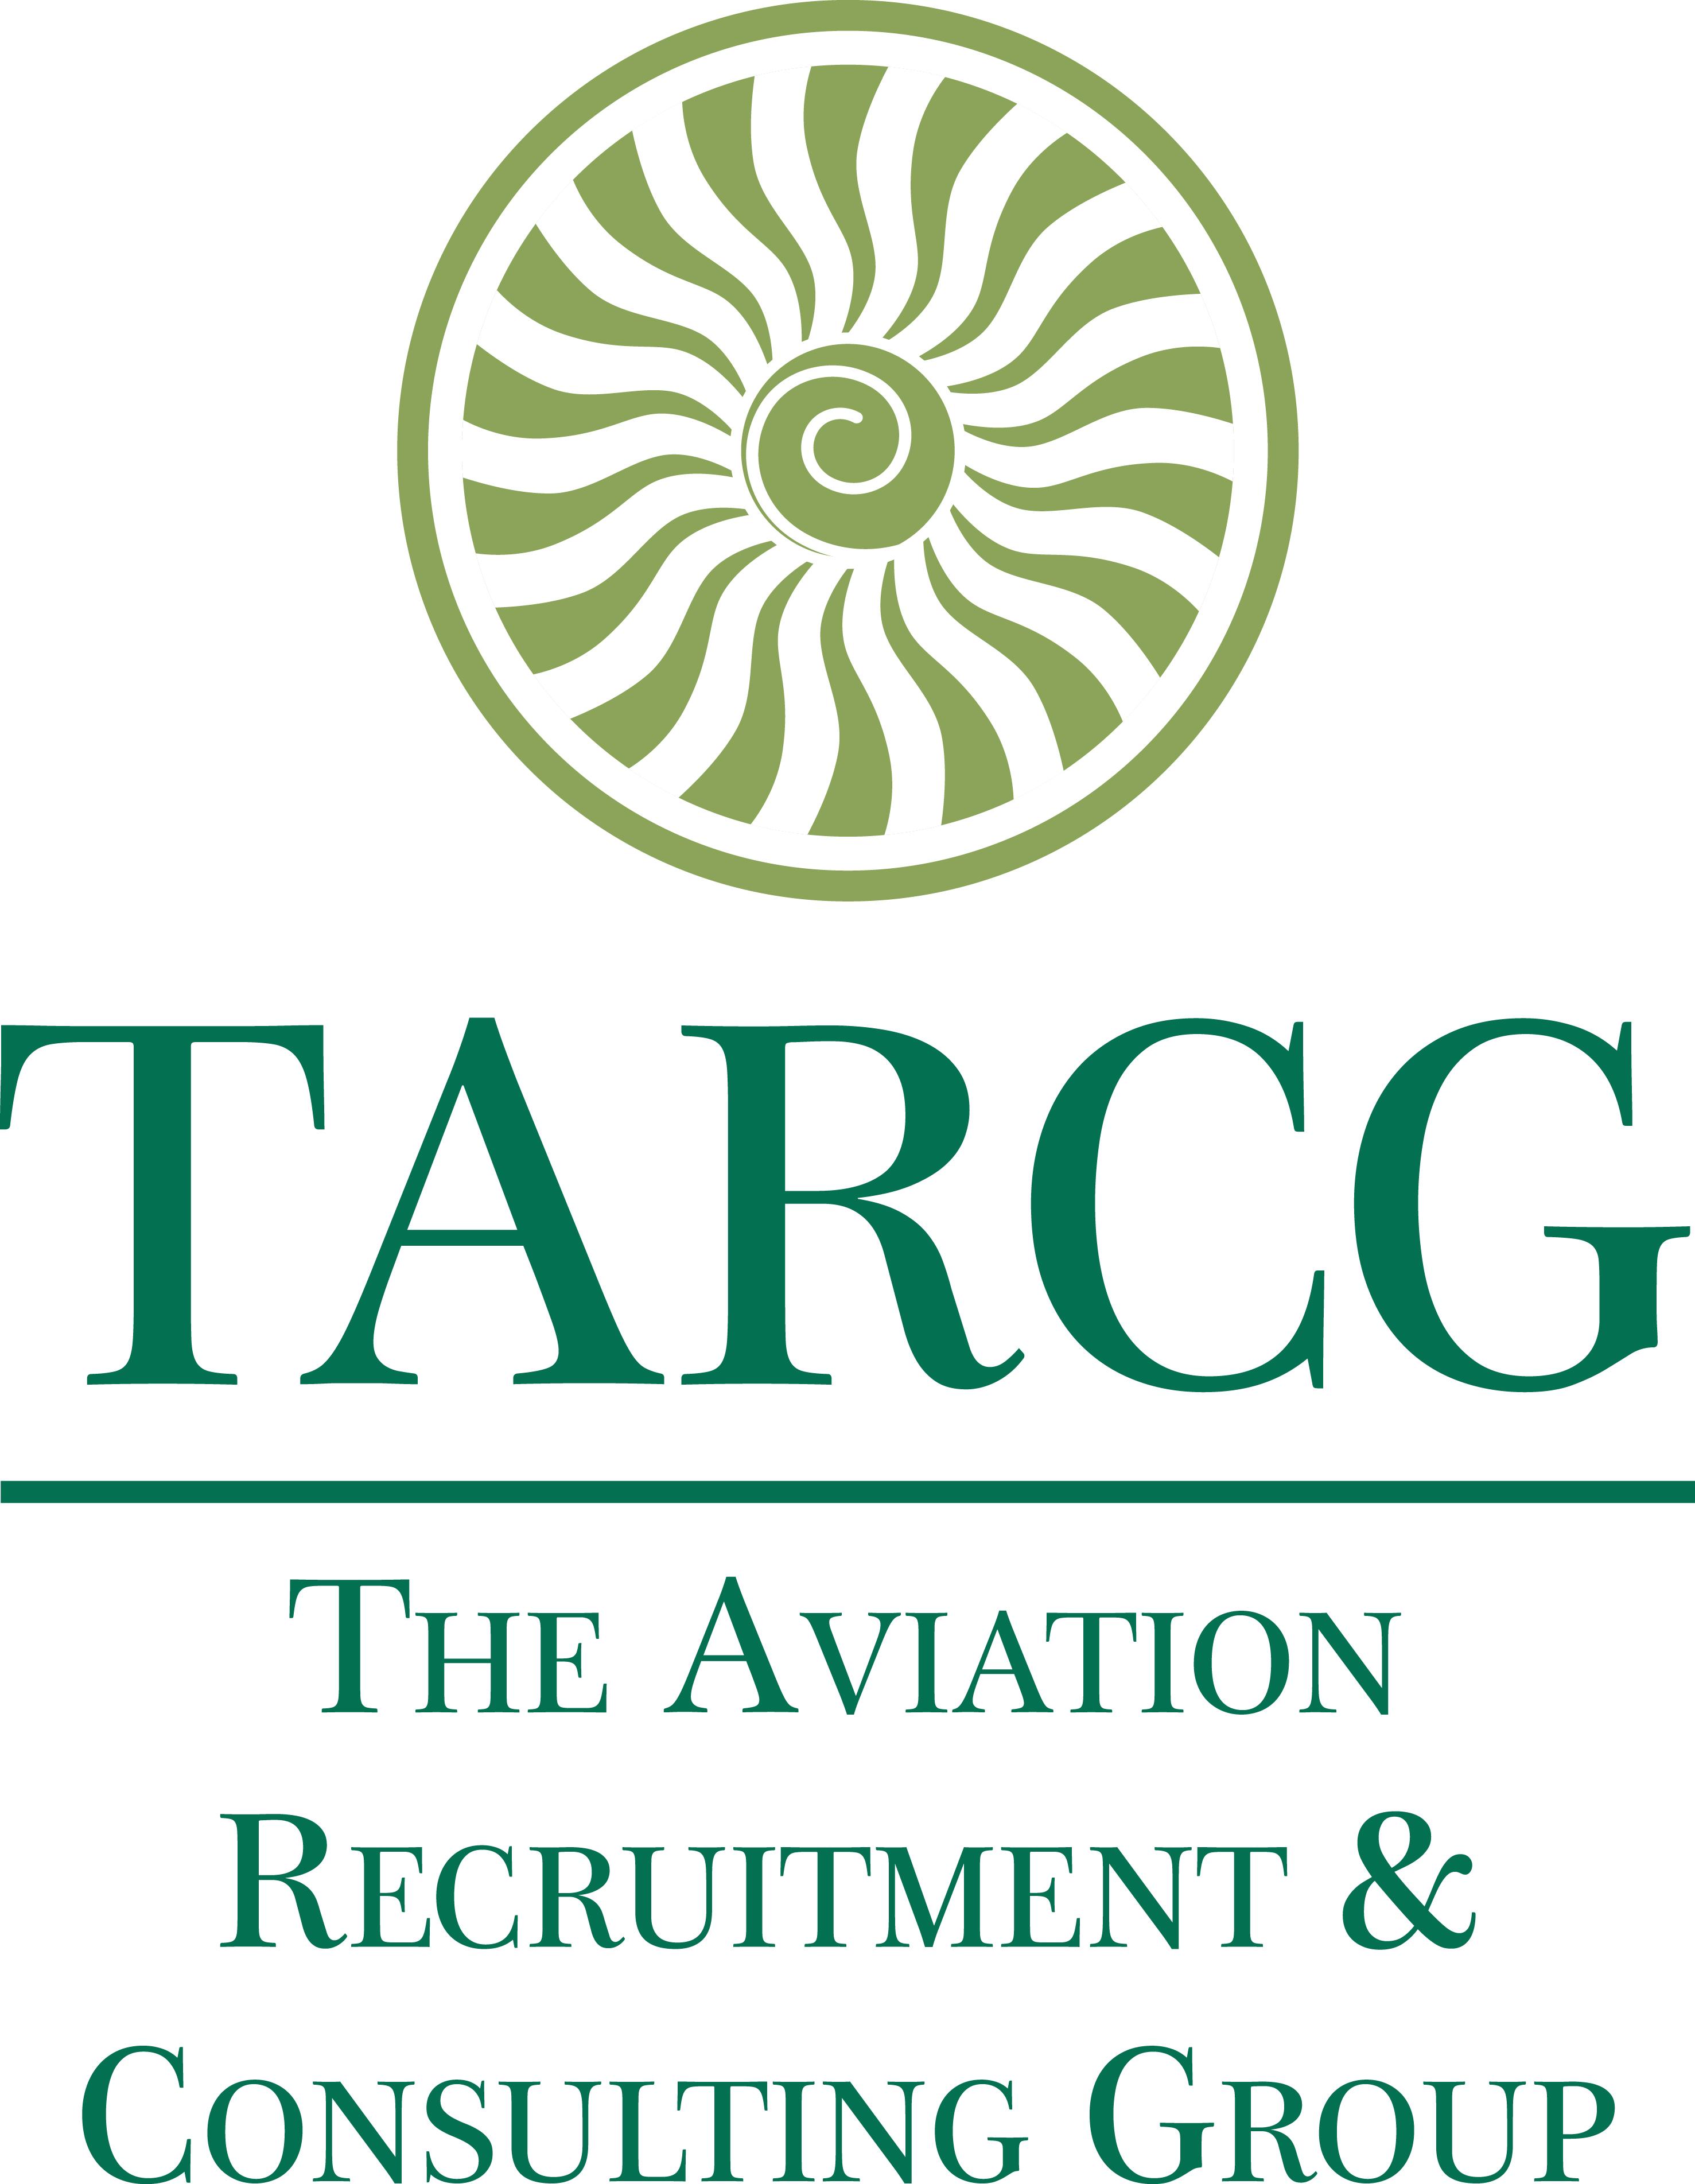 TARCG Aviation